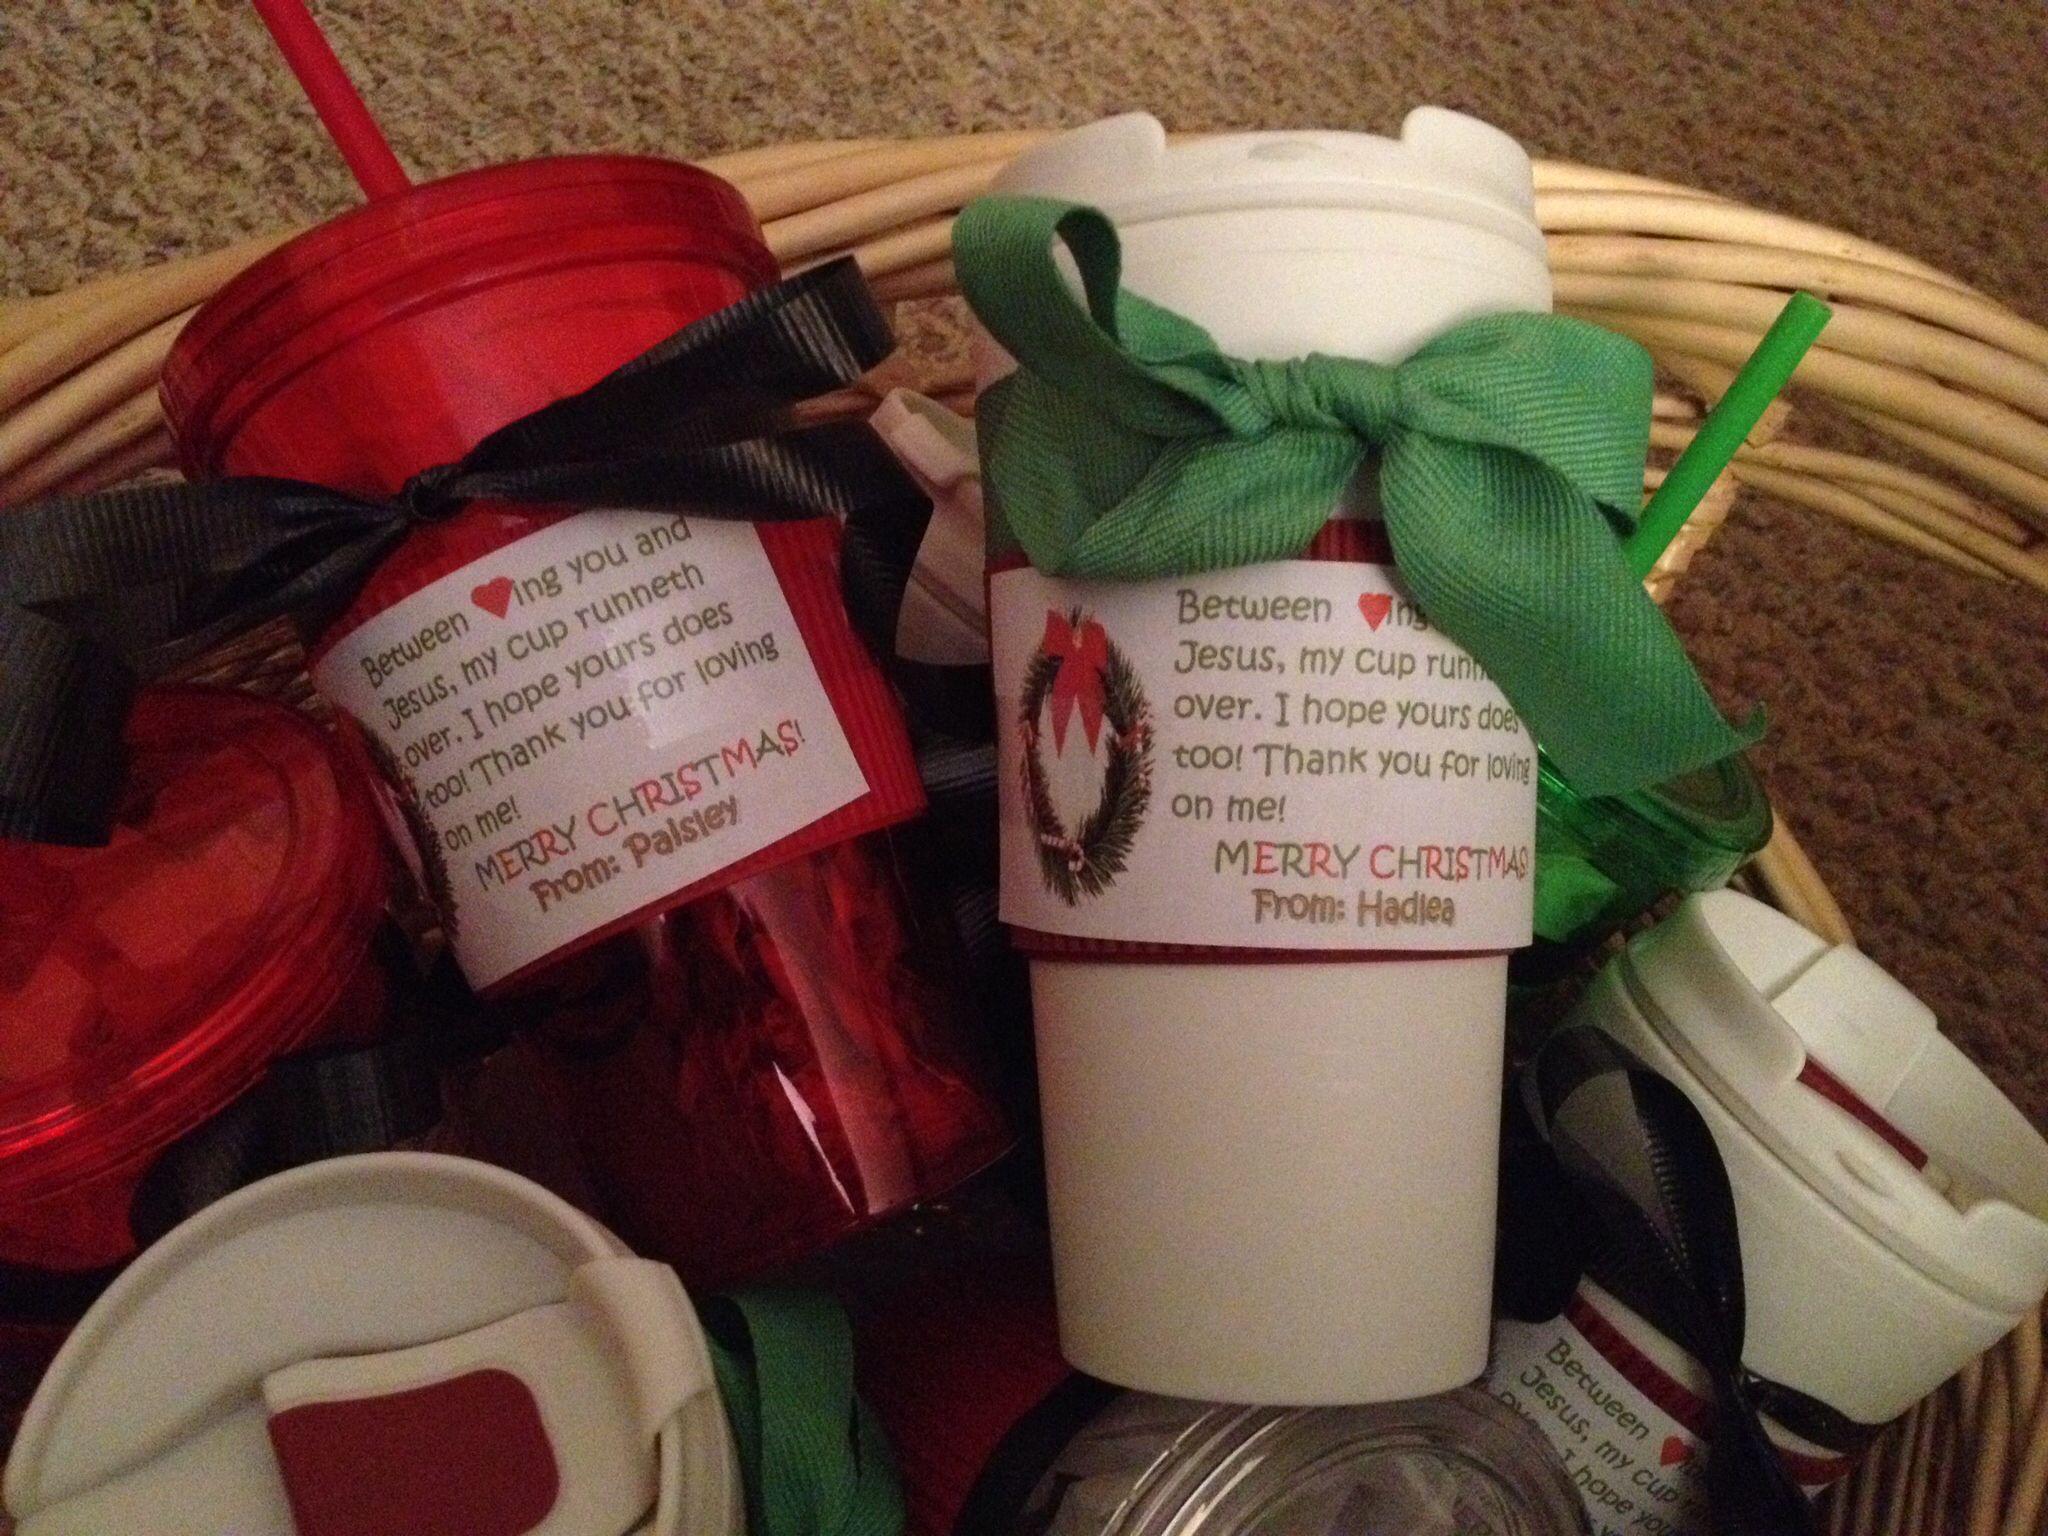 Sunday school teacher gift The